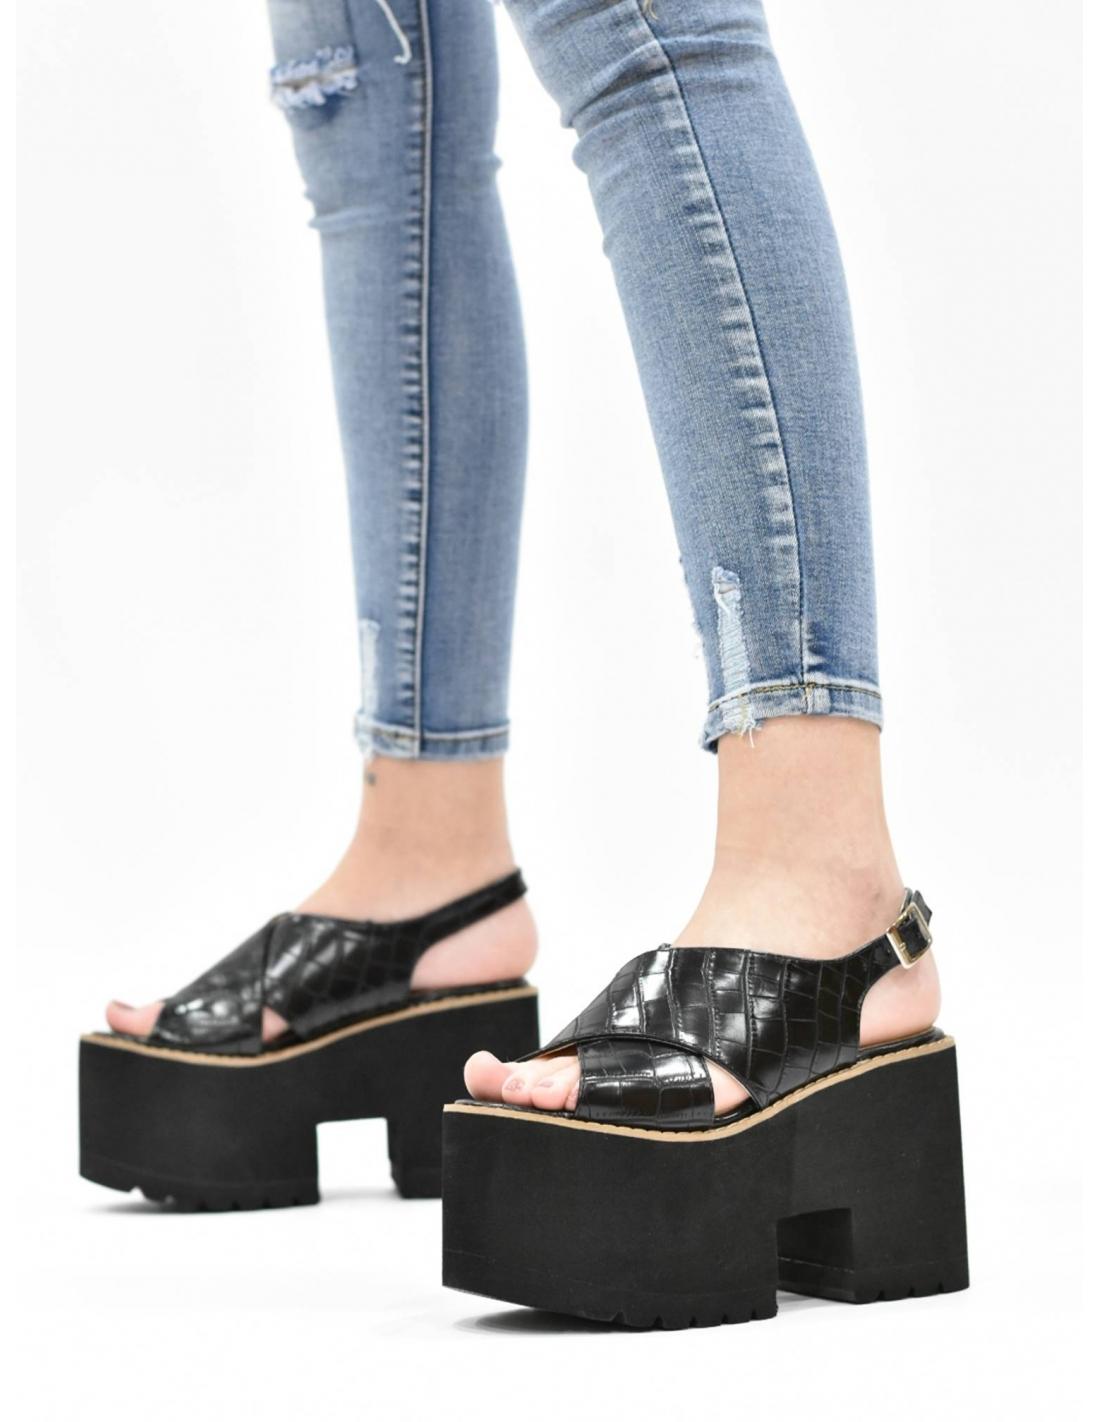 Sandalia cruzada de plataforma coco /...